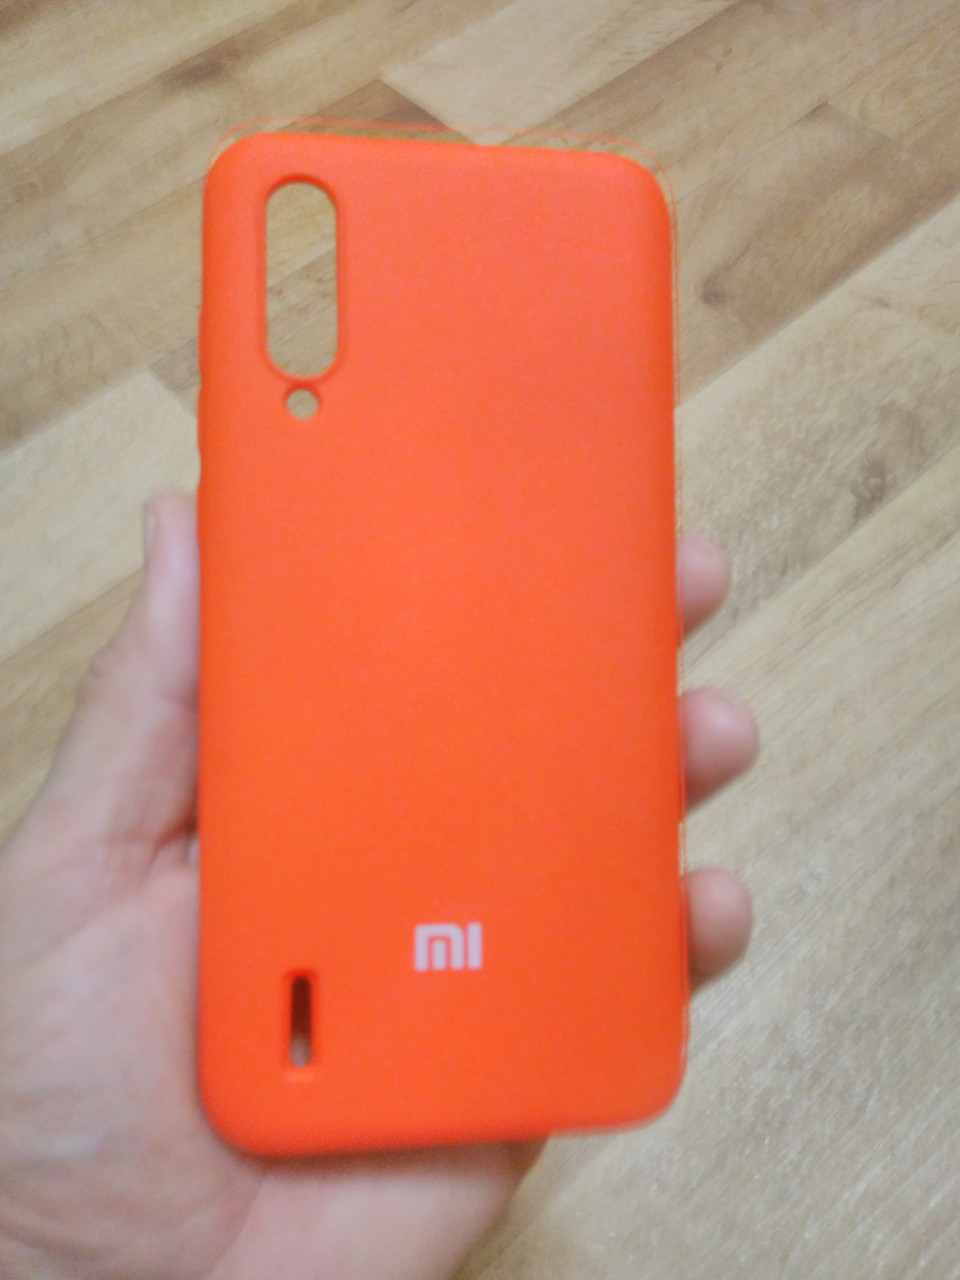 Накладка   Silicon Cover full   для  Xiaomi  MI  CC9 / MI A3  lite  ( красный)